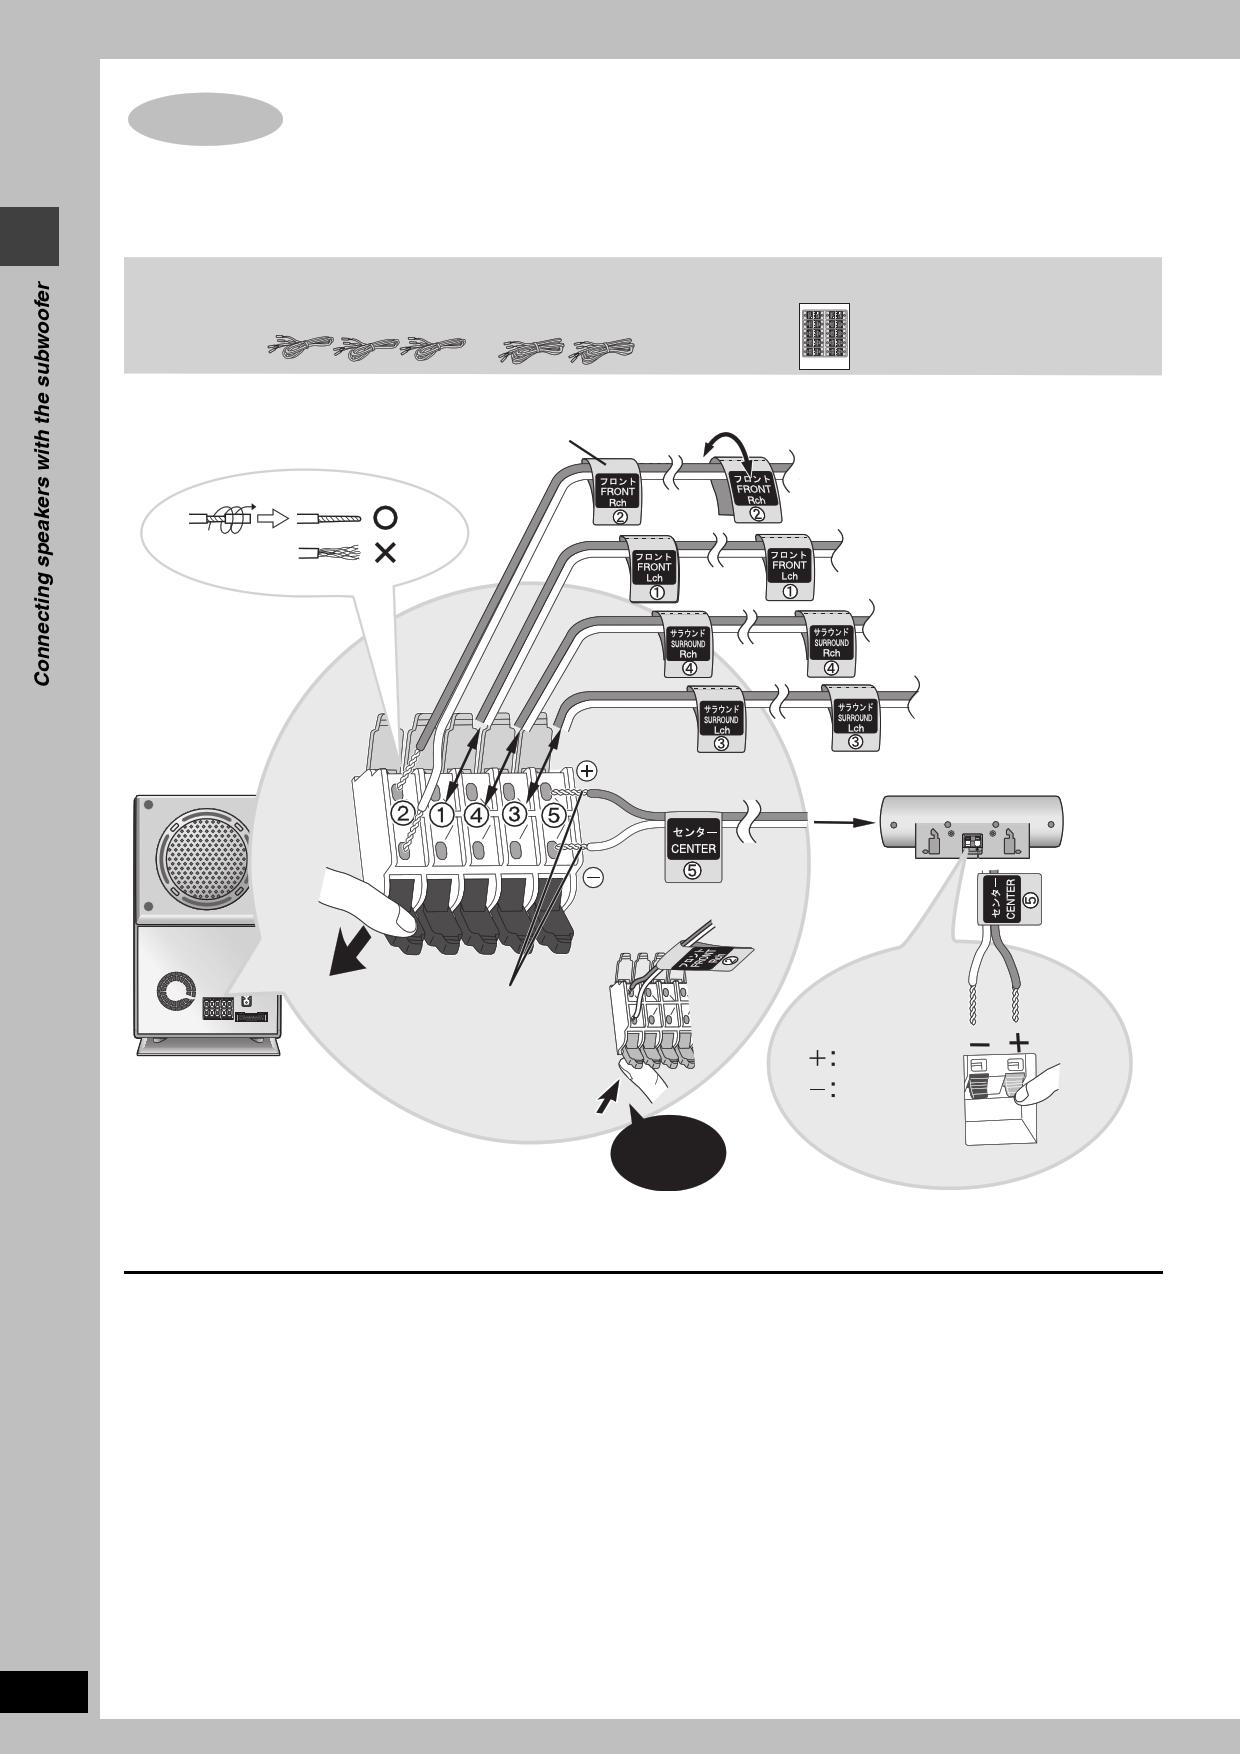 SC-HT720 電子部品, 半導体